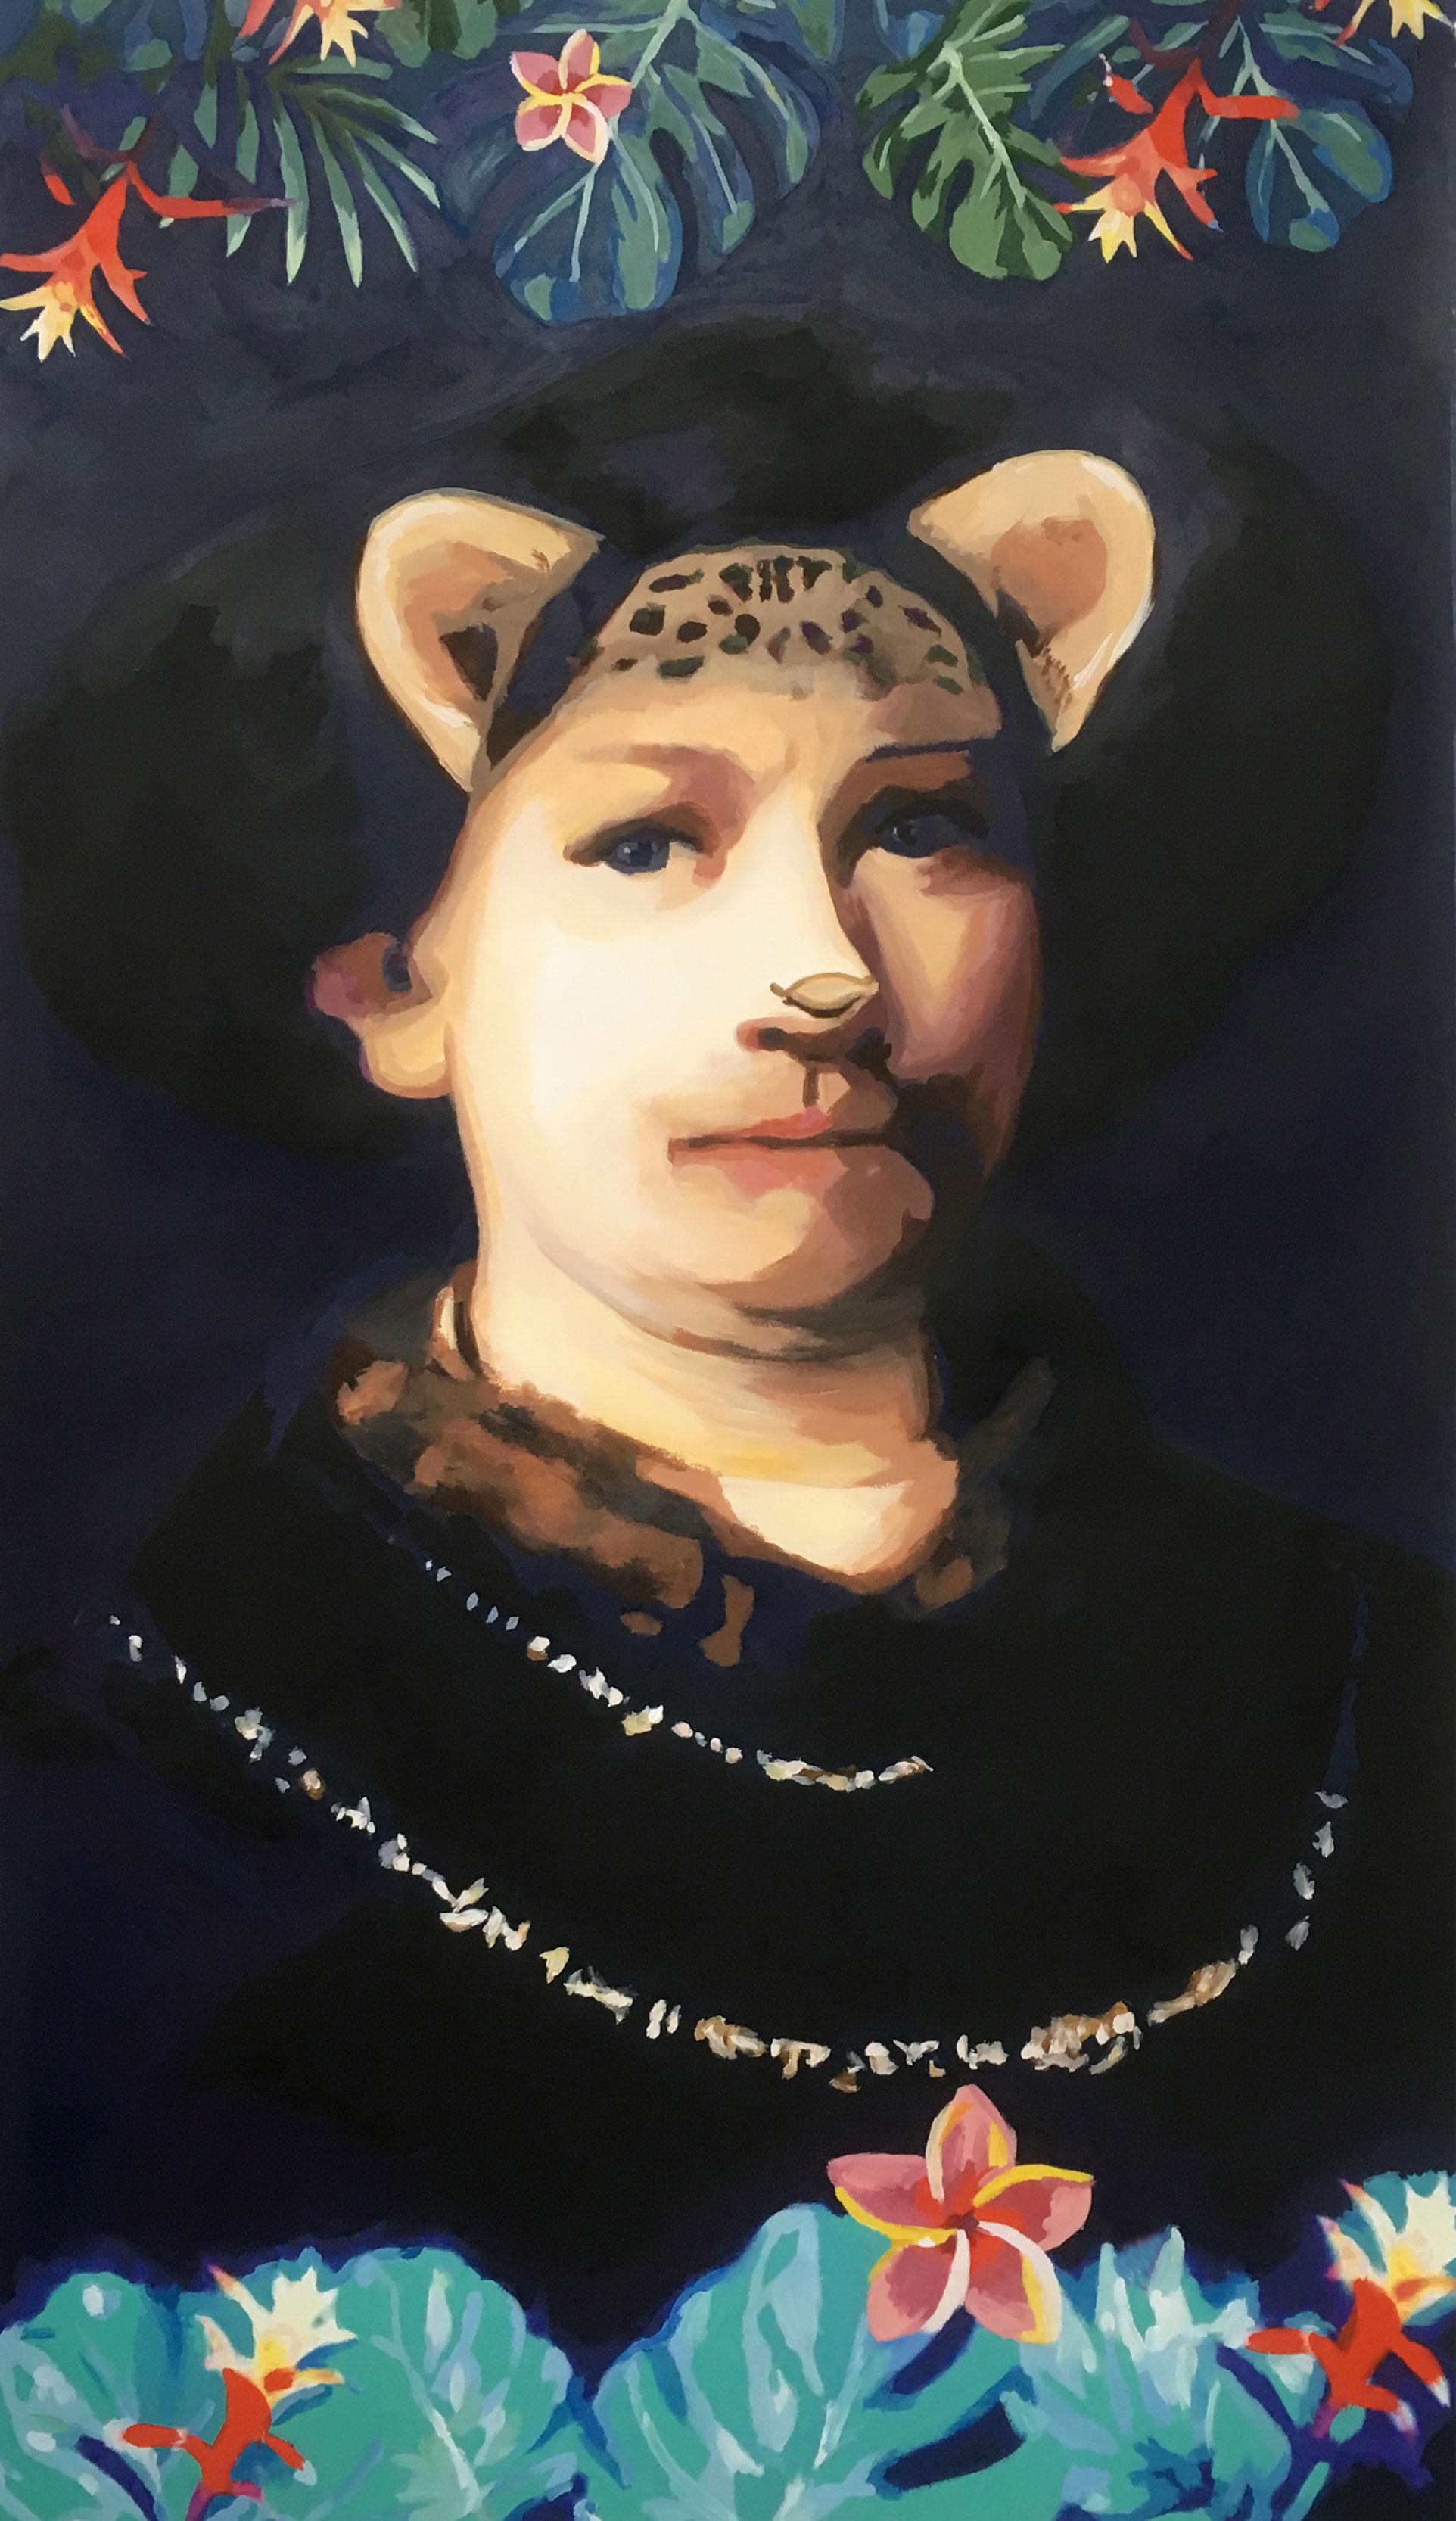 Ana Riaño. Rembrandt. Serie RRSS